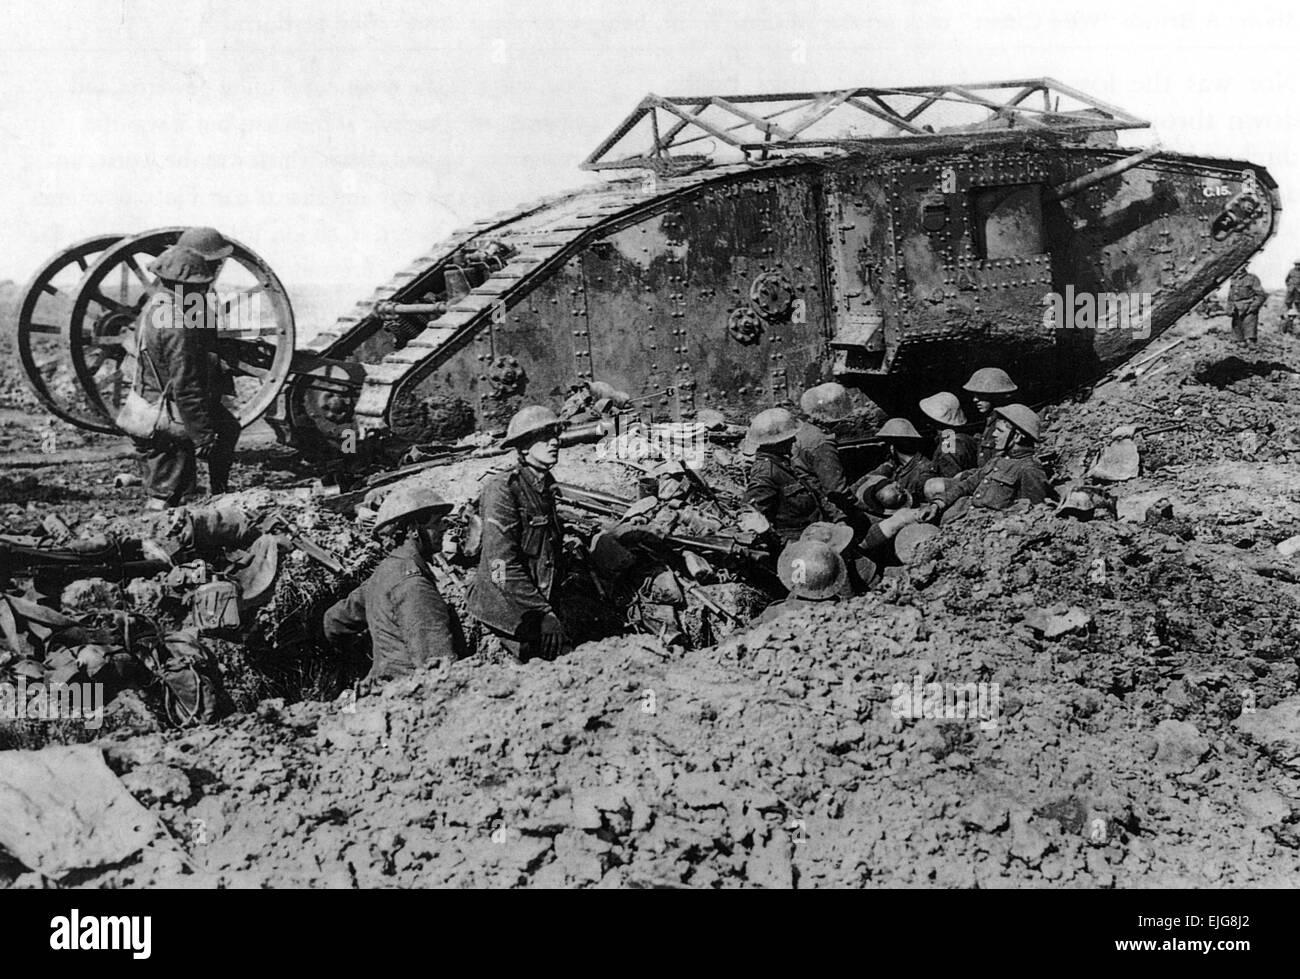 British Tank World War 1 Stockfotos & British Tank World War 1 ...